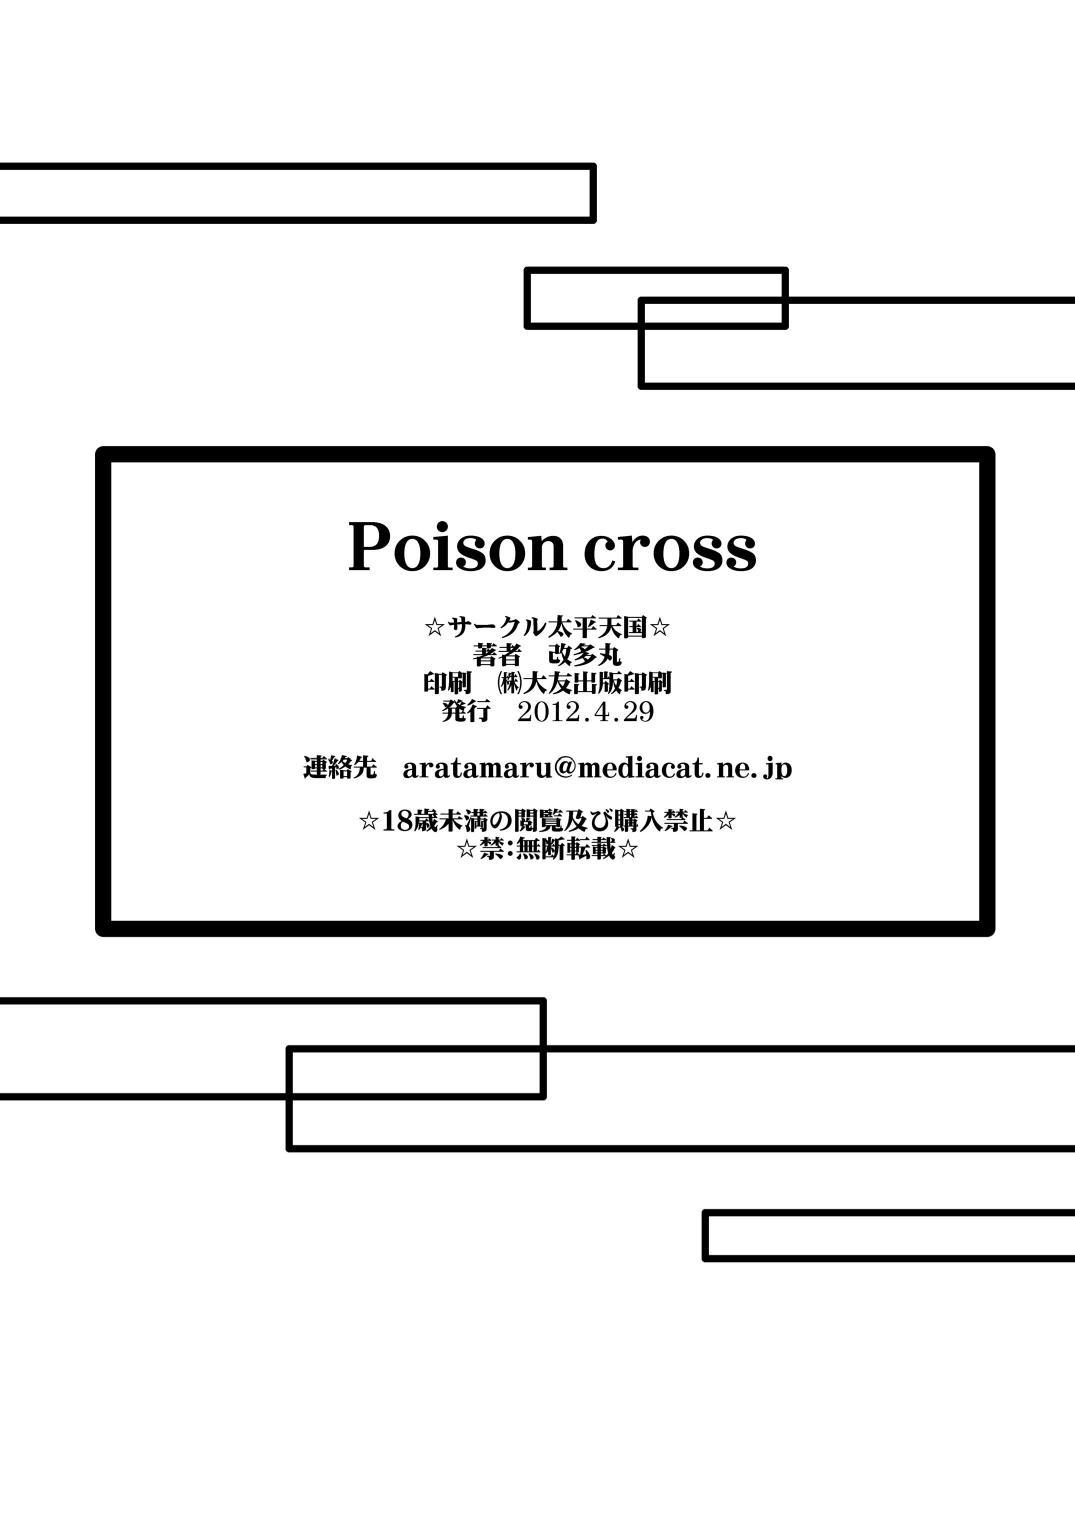 Poison cross 20